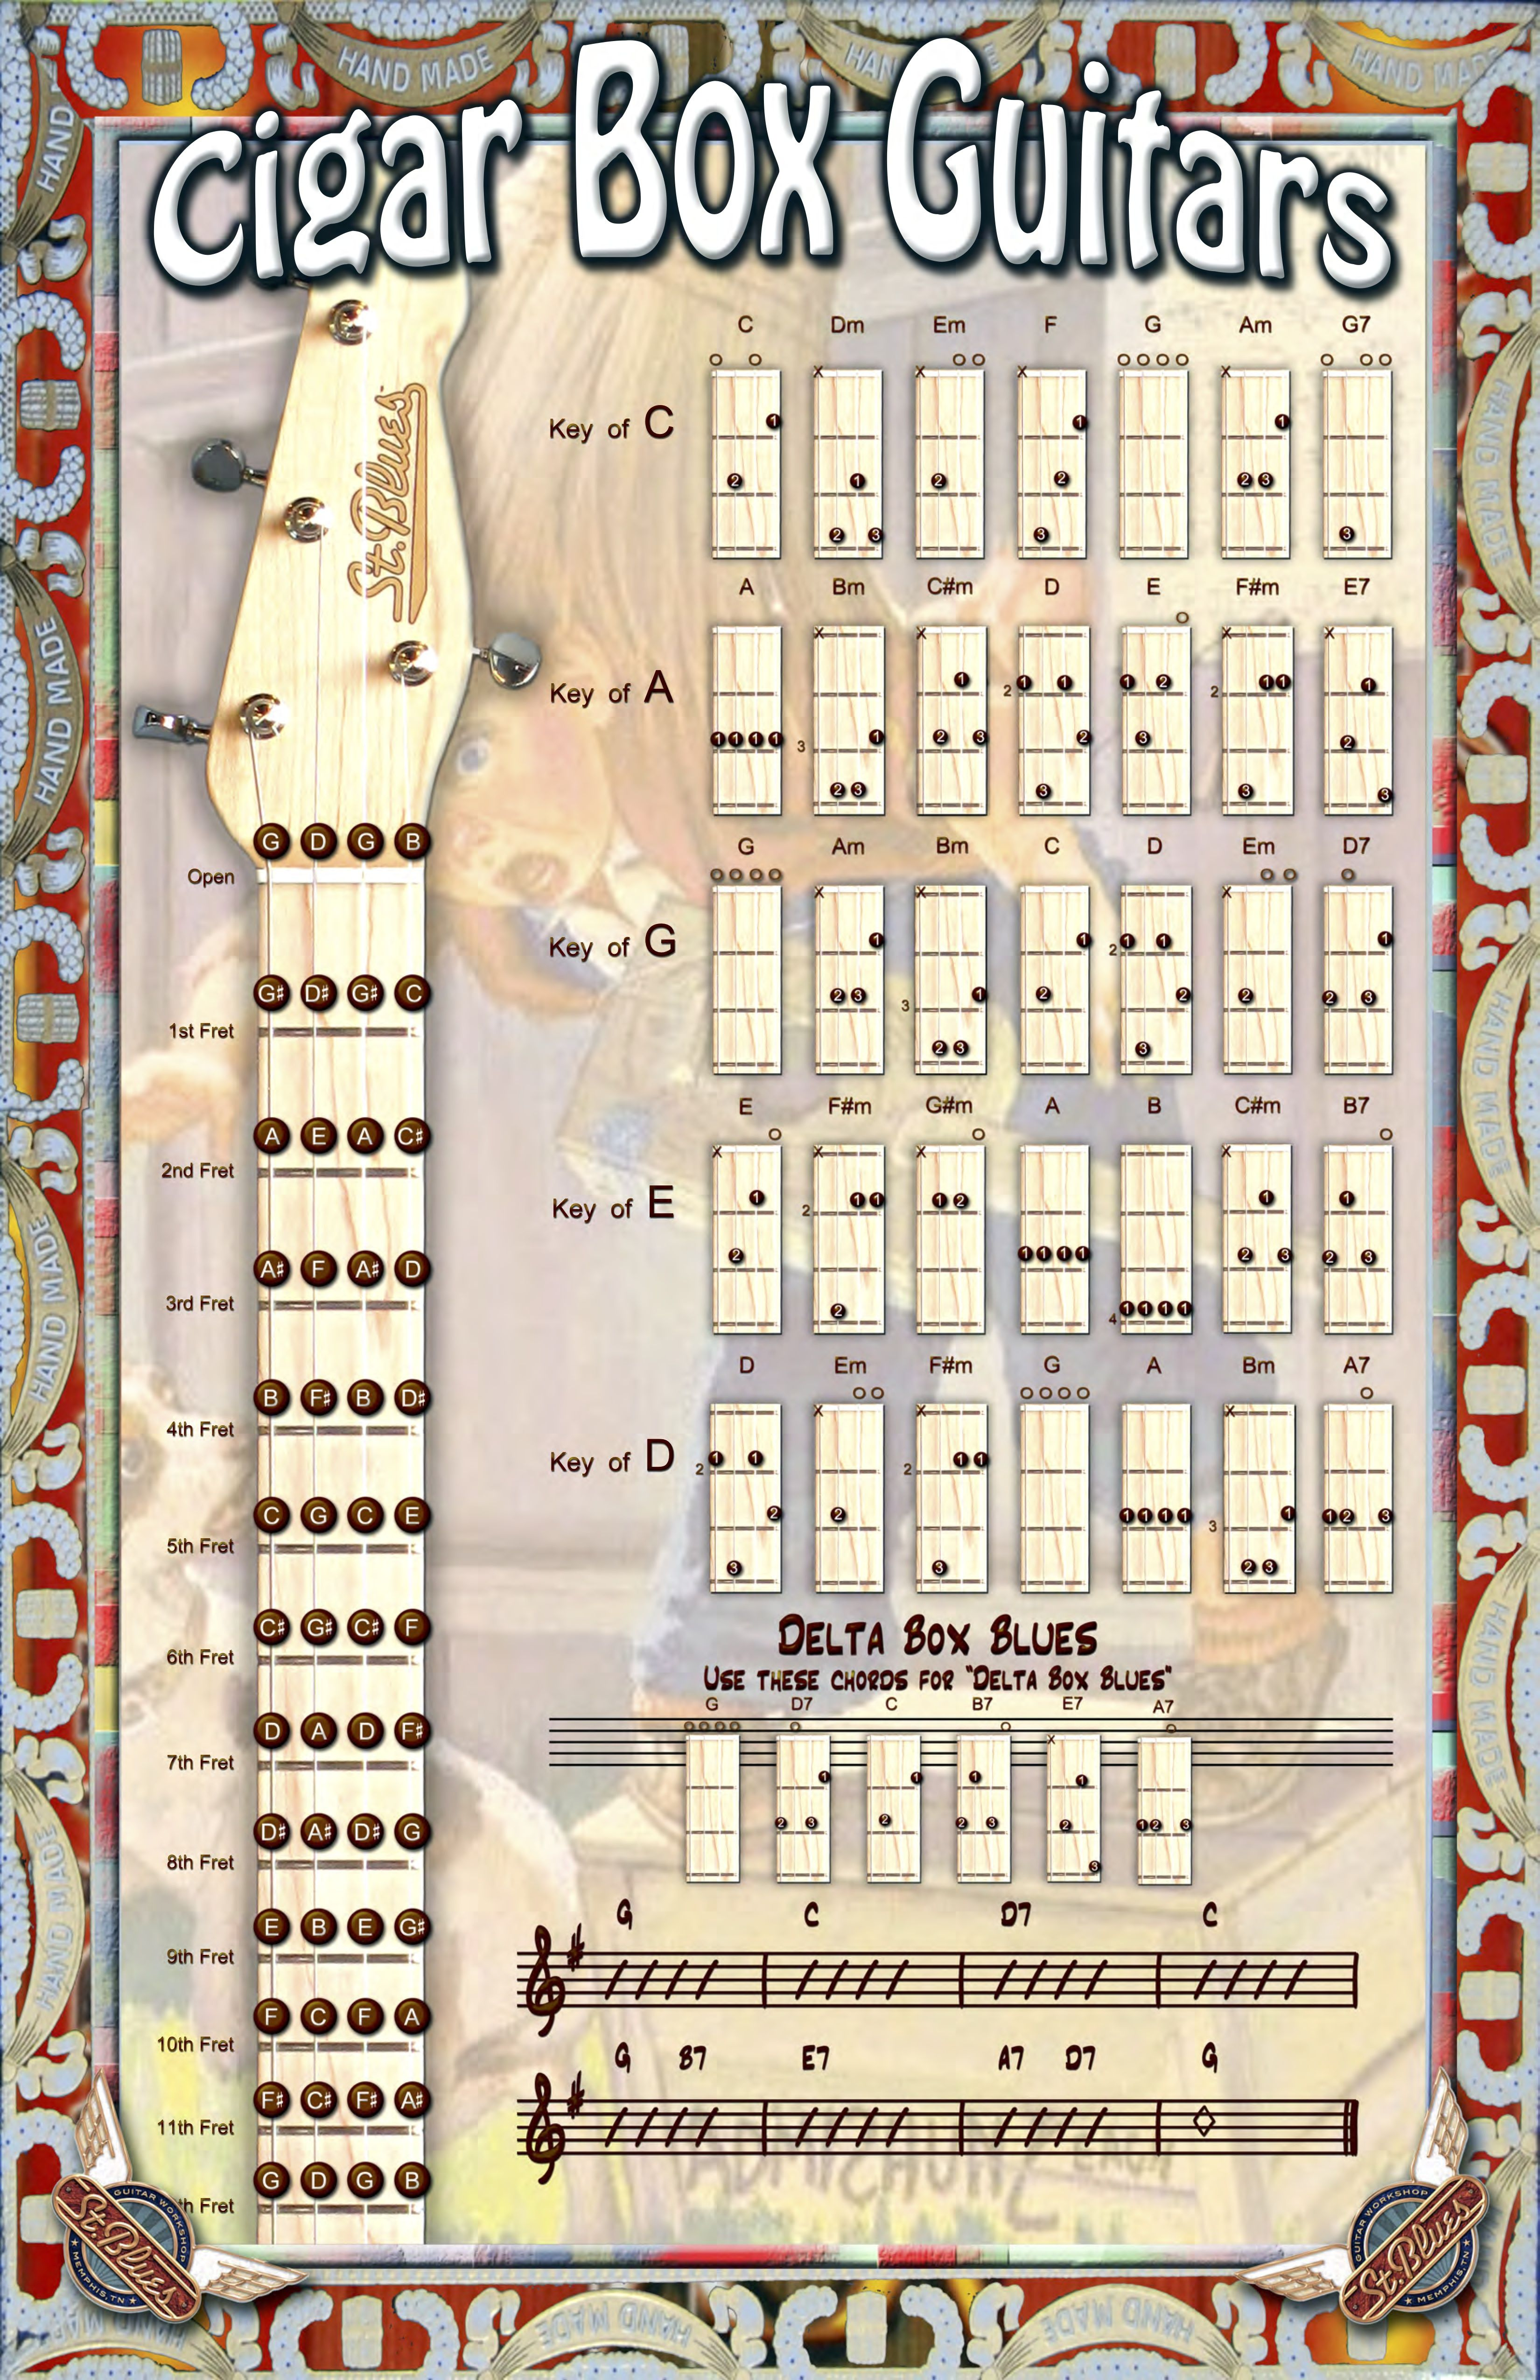 Chord Chart For Our Cigar Box Guitars Eeeeeee My Cbg Kit Should Be Here Next Week Cigar Box Guitar Box Guitar Cigar Box Guitar Plans